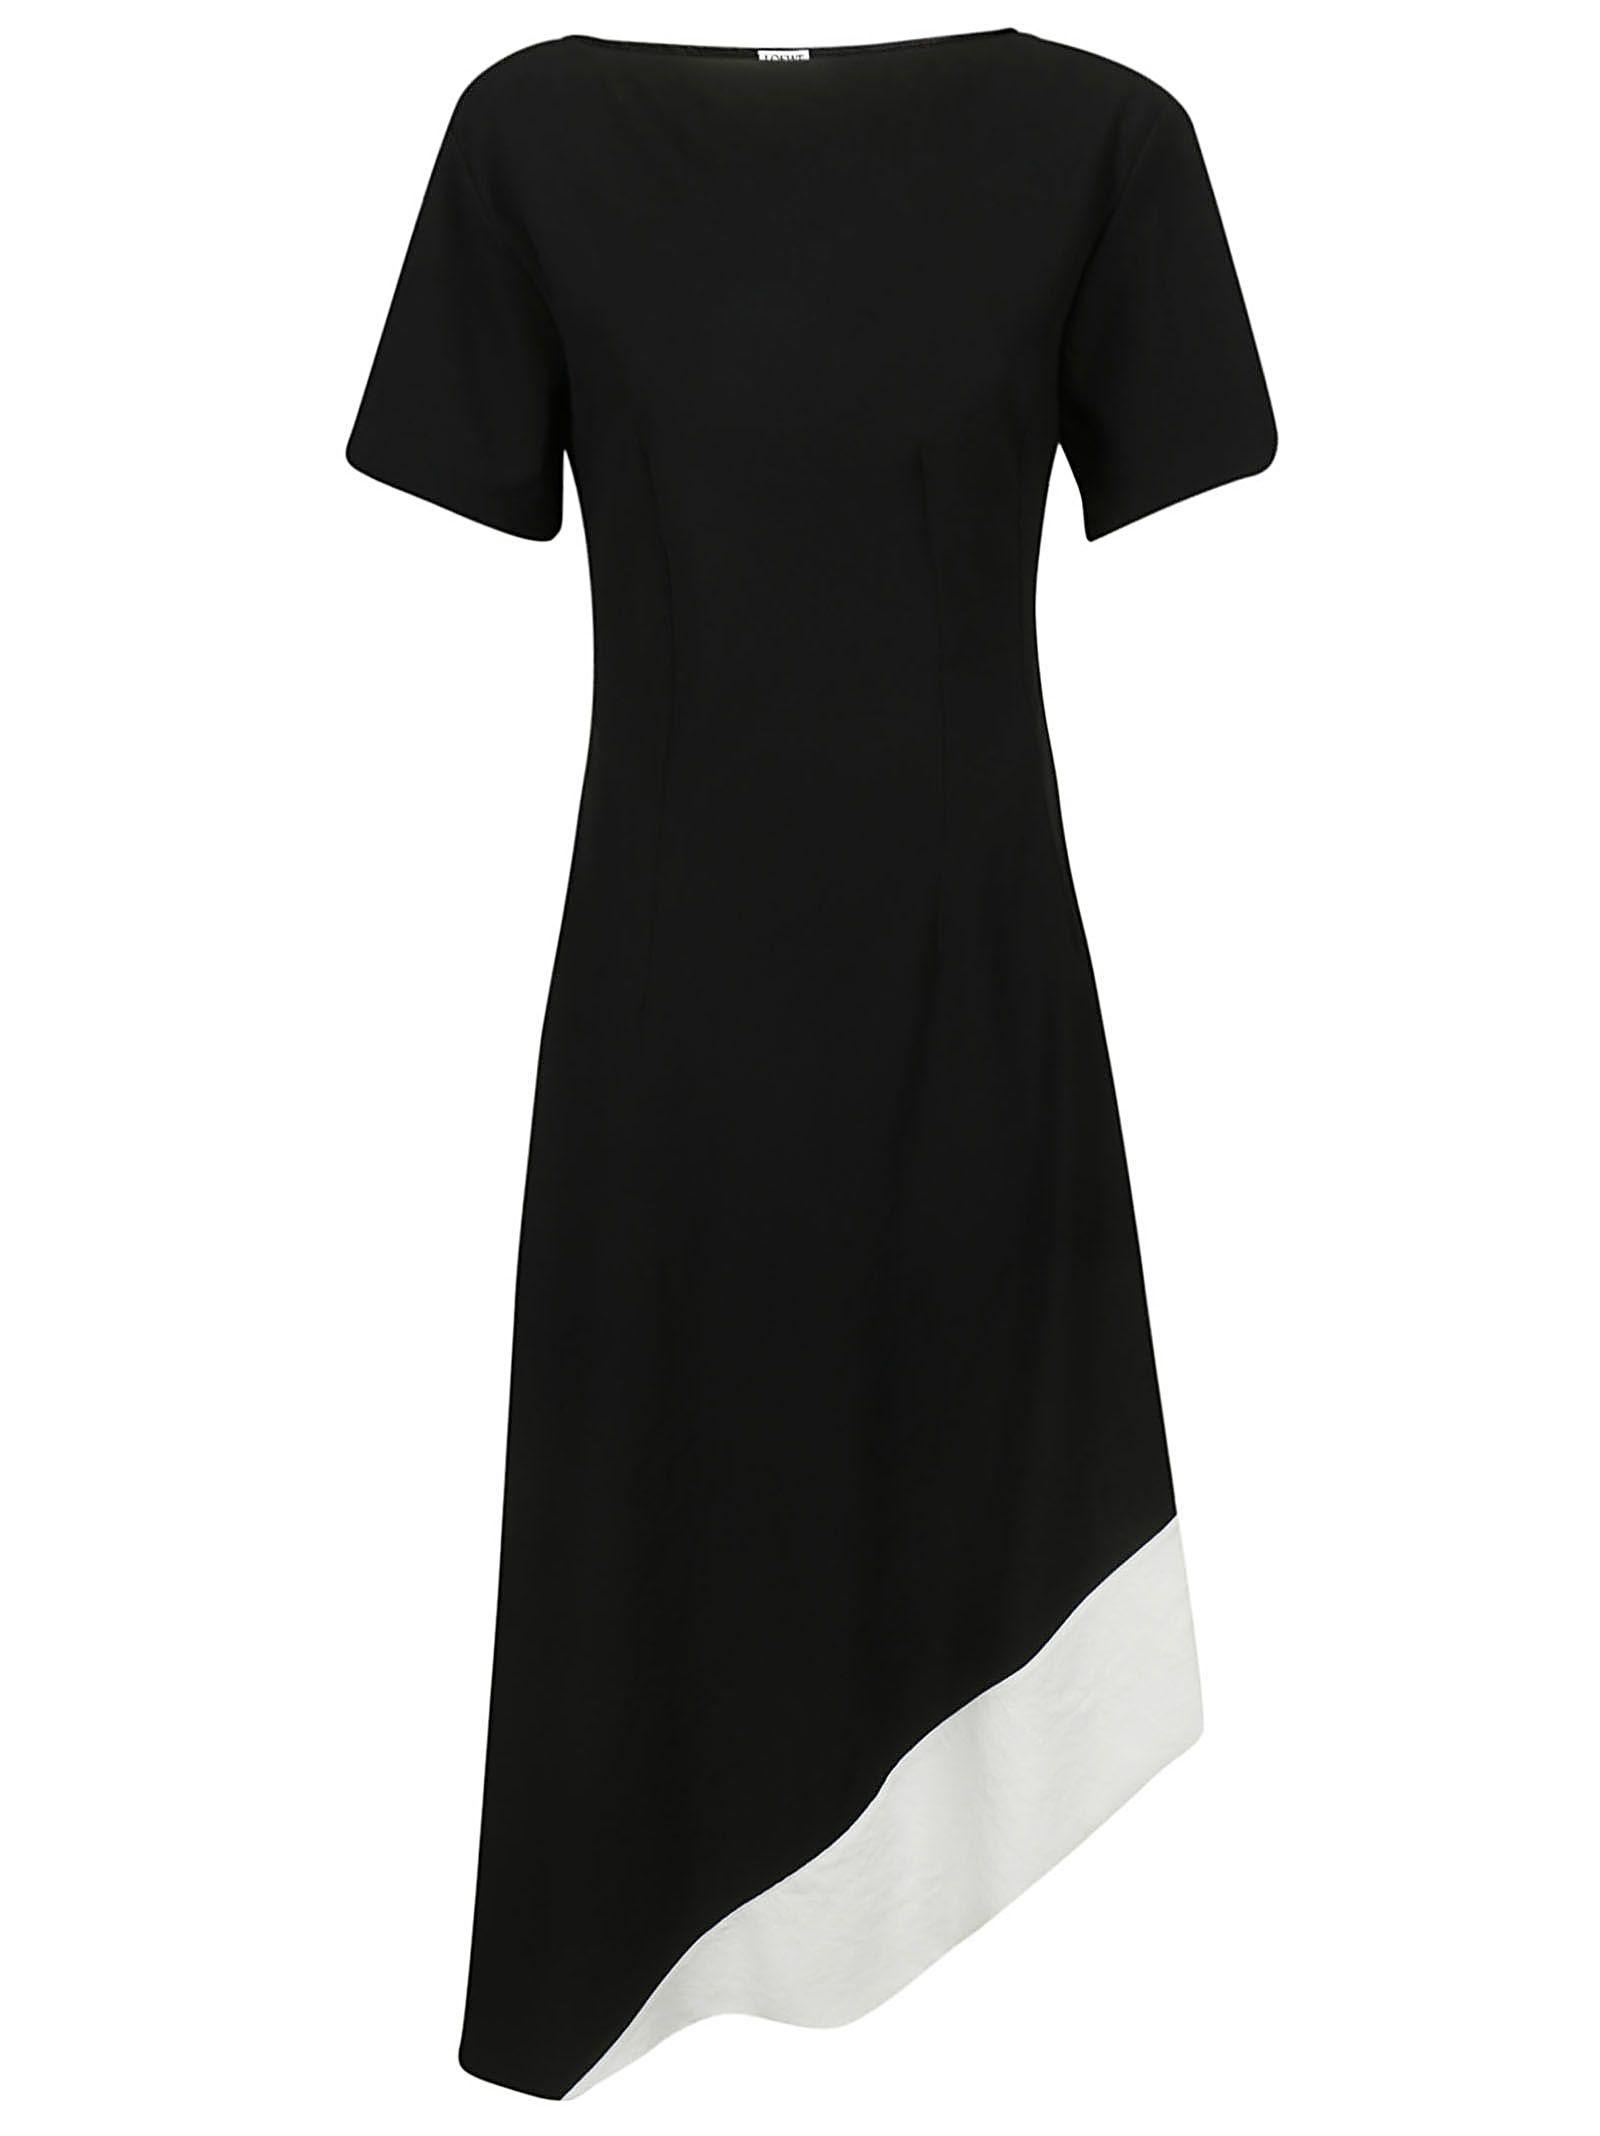 Italist Blackwhite Dress Asymmetric 10737596 Loewe wPUOqw